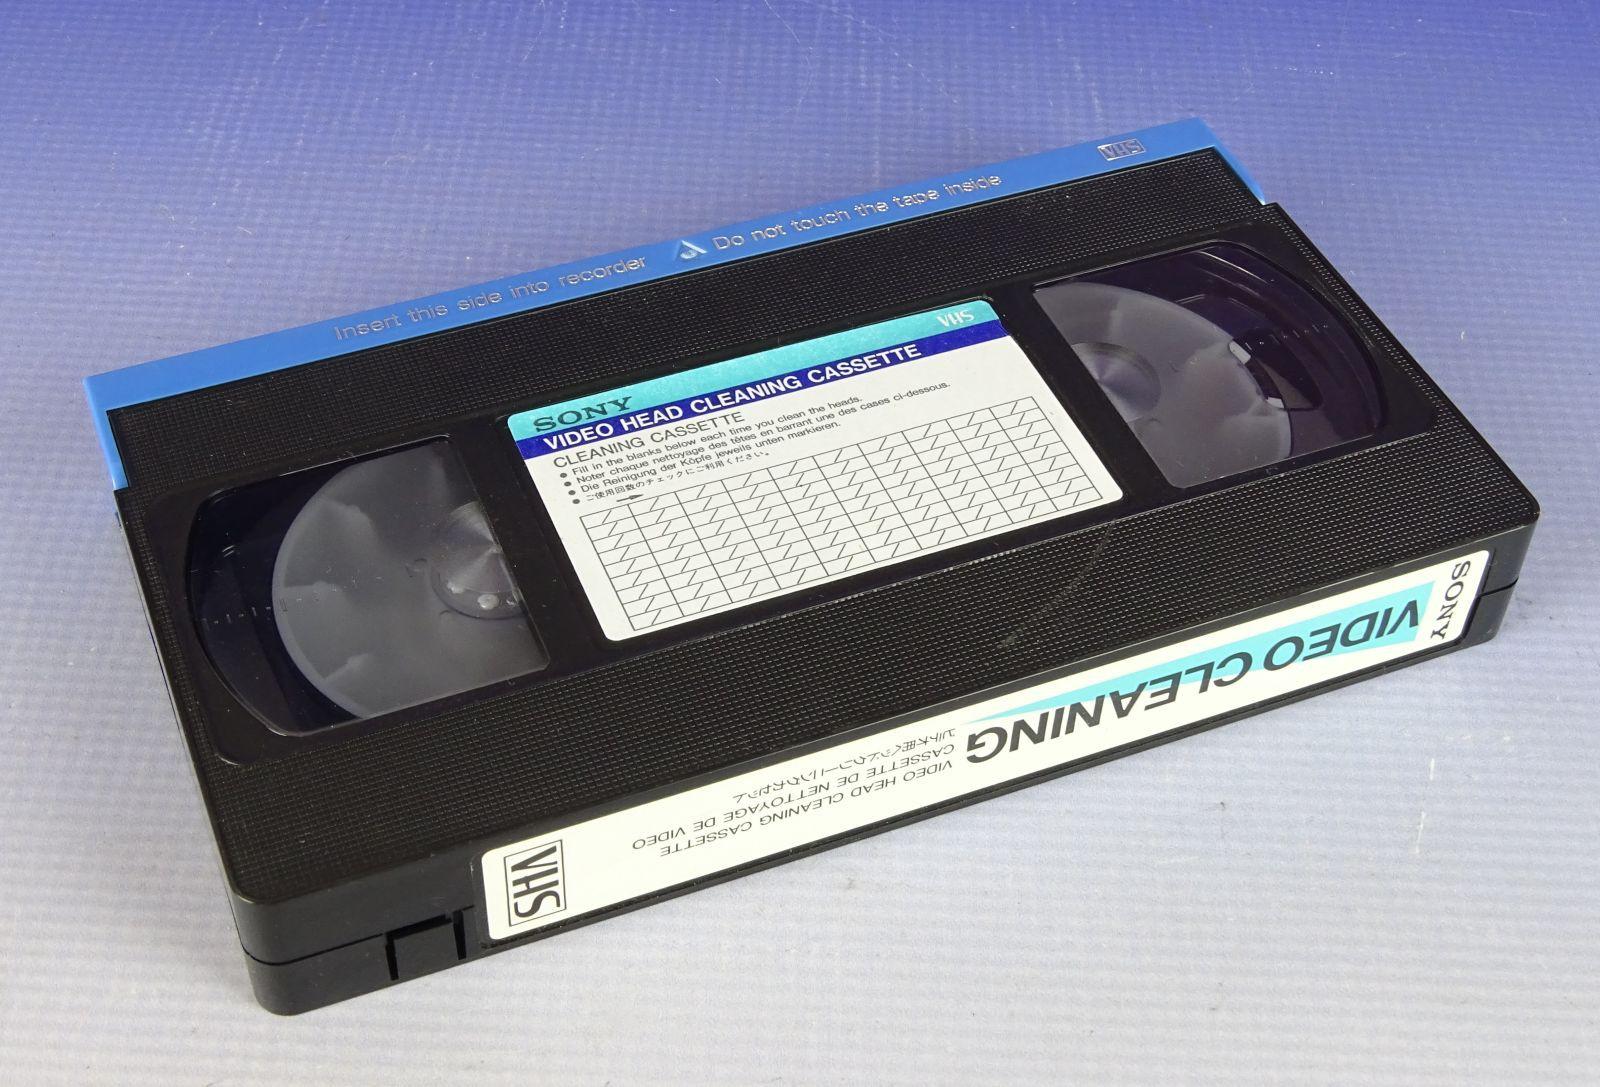 DSC00180.JPG (1600�1087)